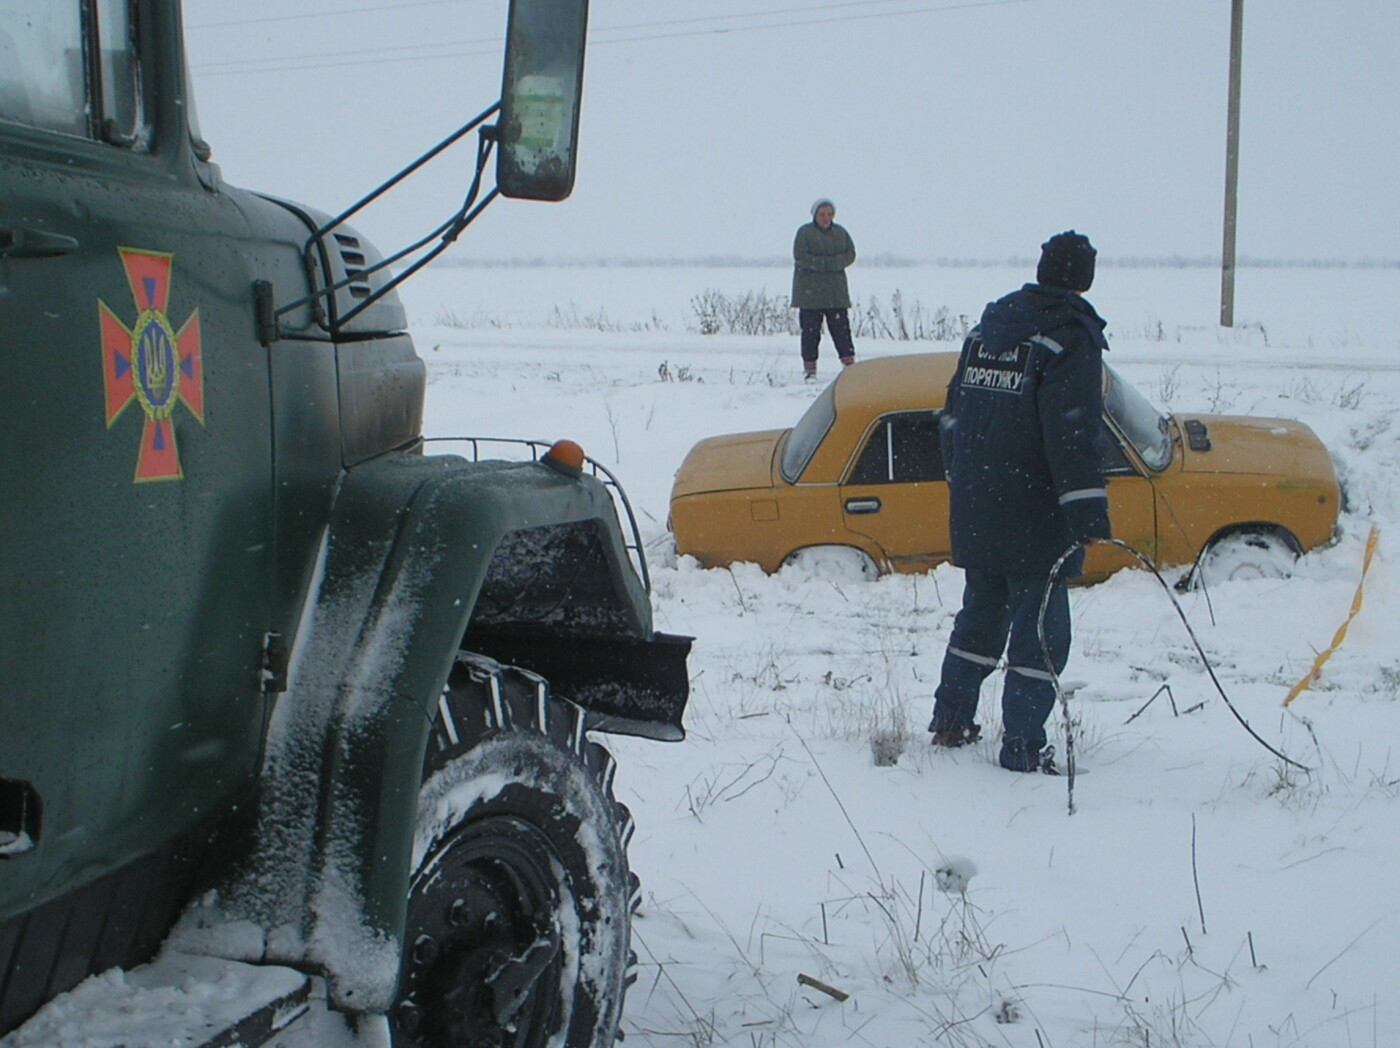 В Запорожской области машина застряла в песке и снегу: доставали спасатели, - ФОТО, фото-3